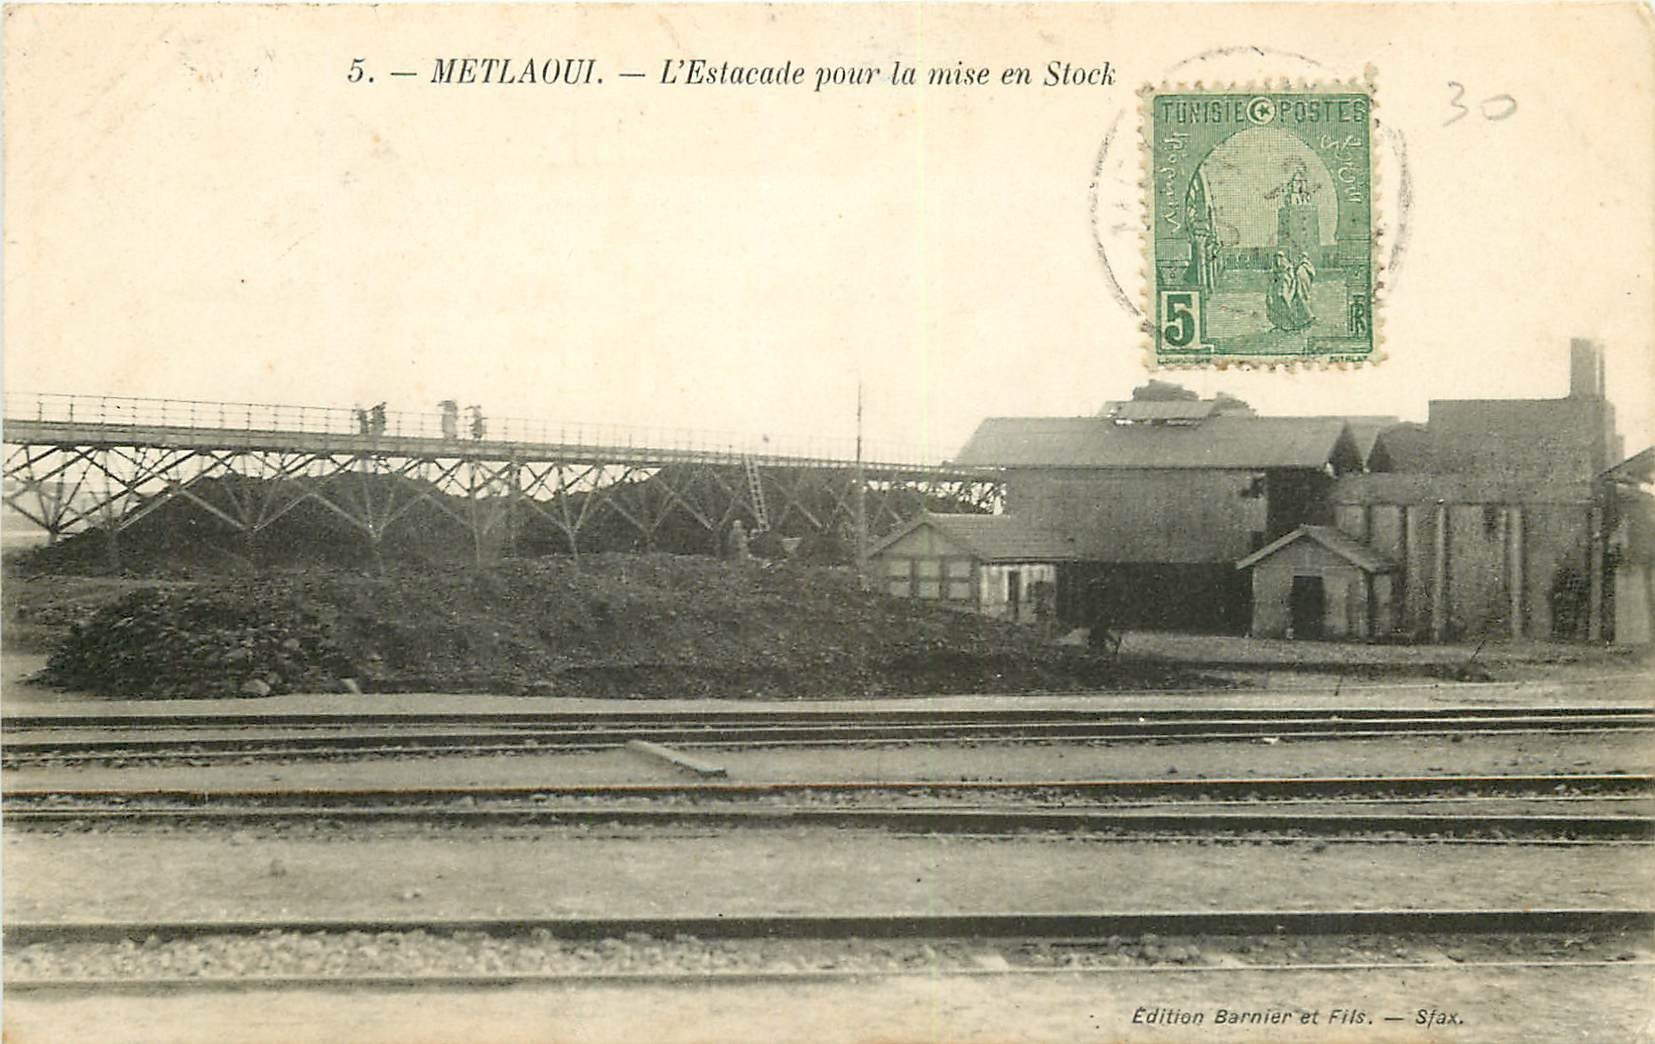 WW METLAOUI. Estacade pour la mise en Stock en Tunisie 1910